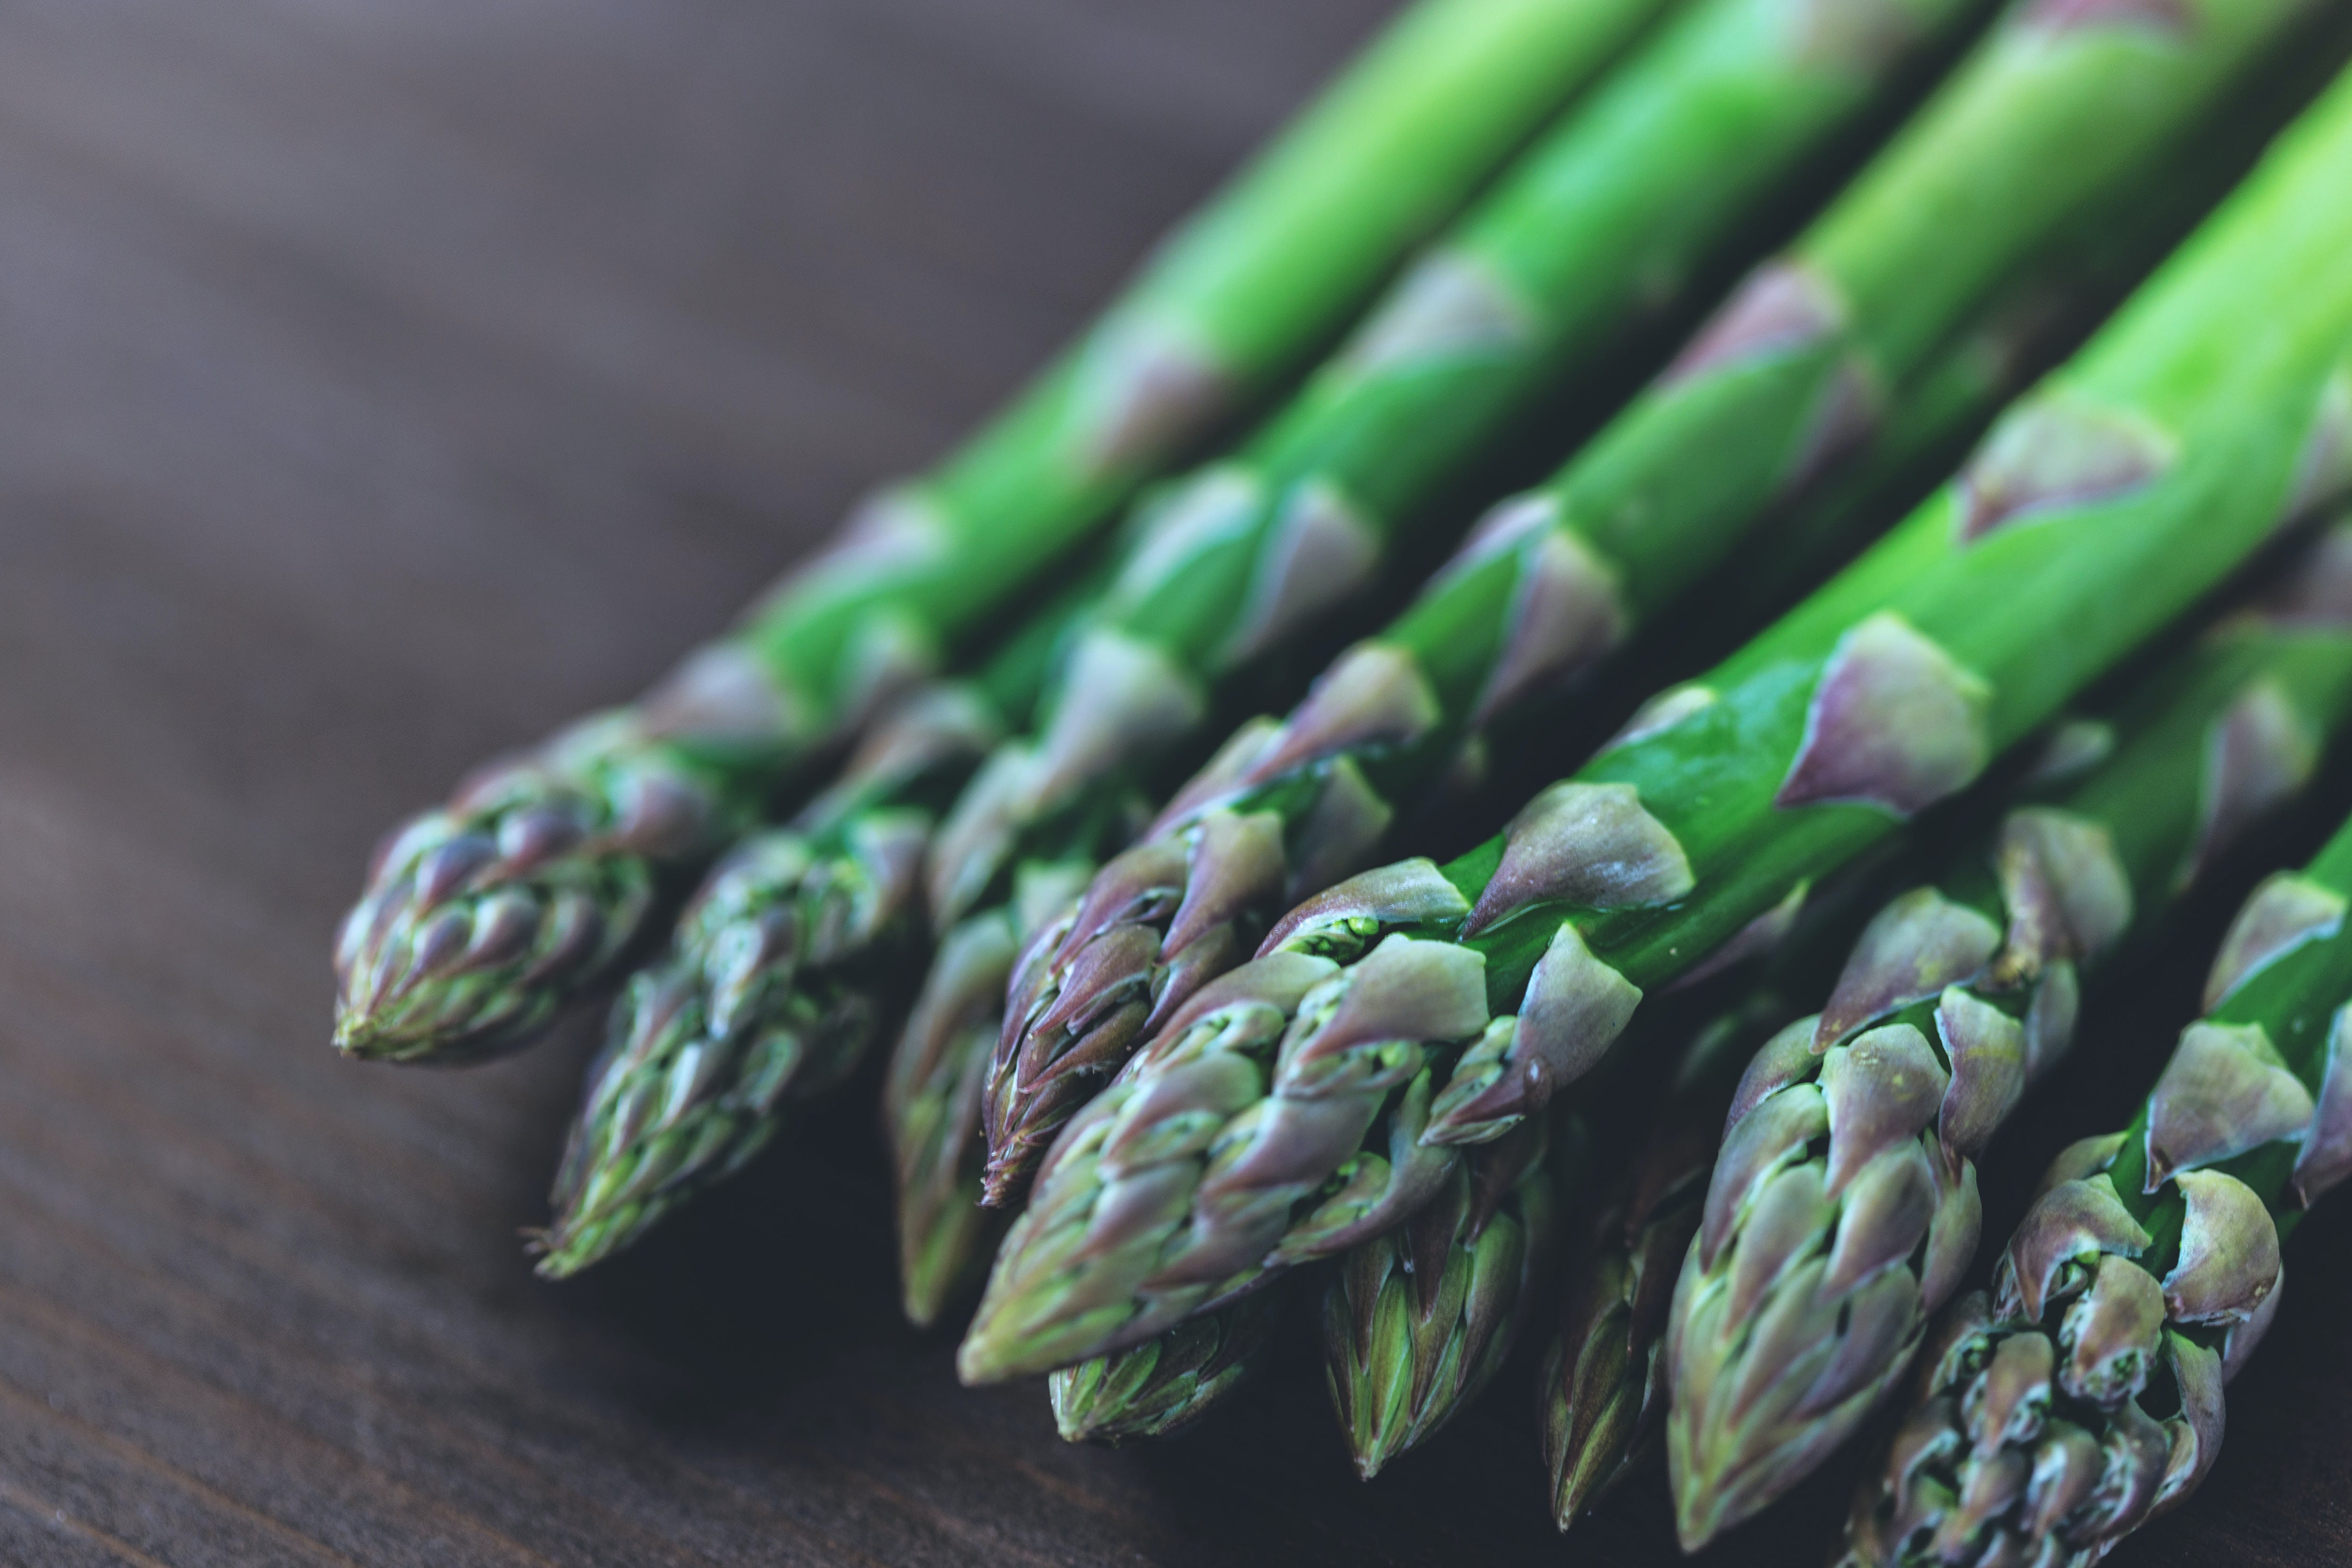 Shallow Photo of Asparagus